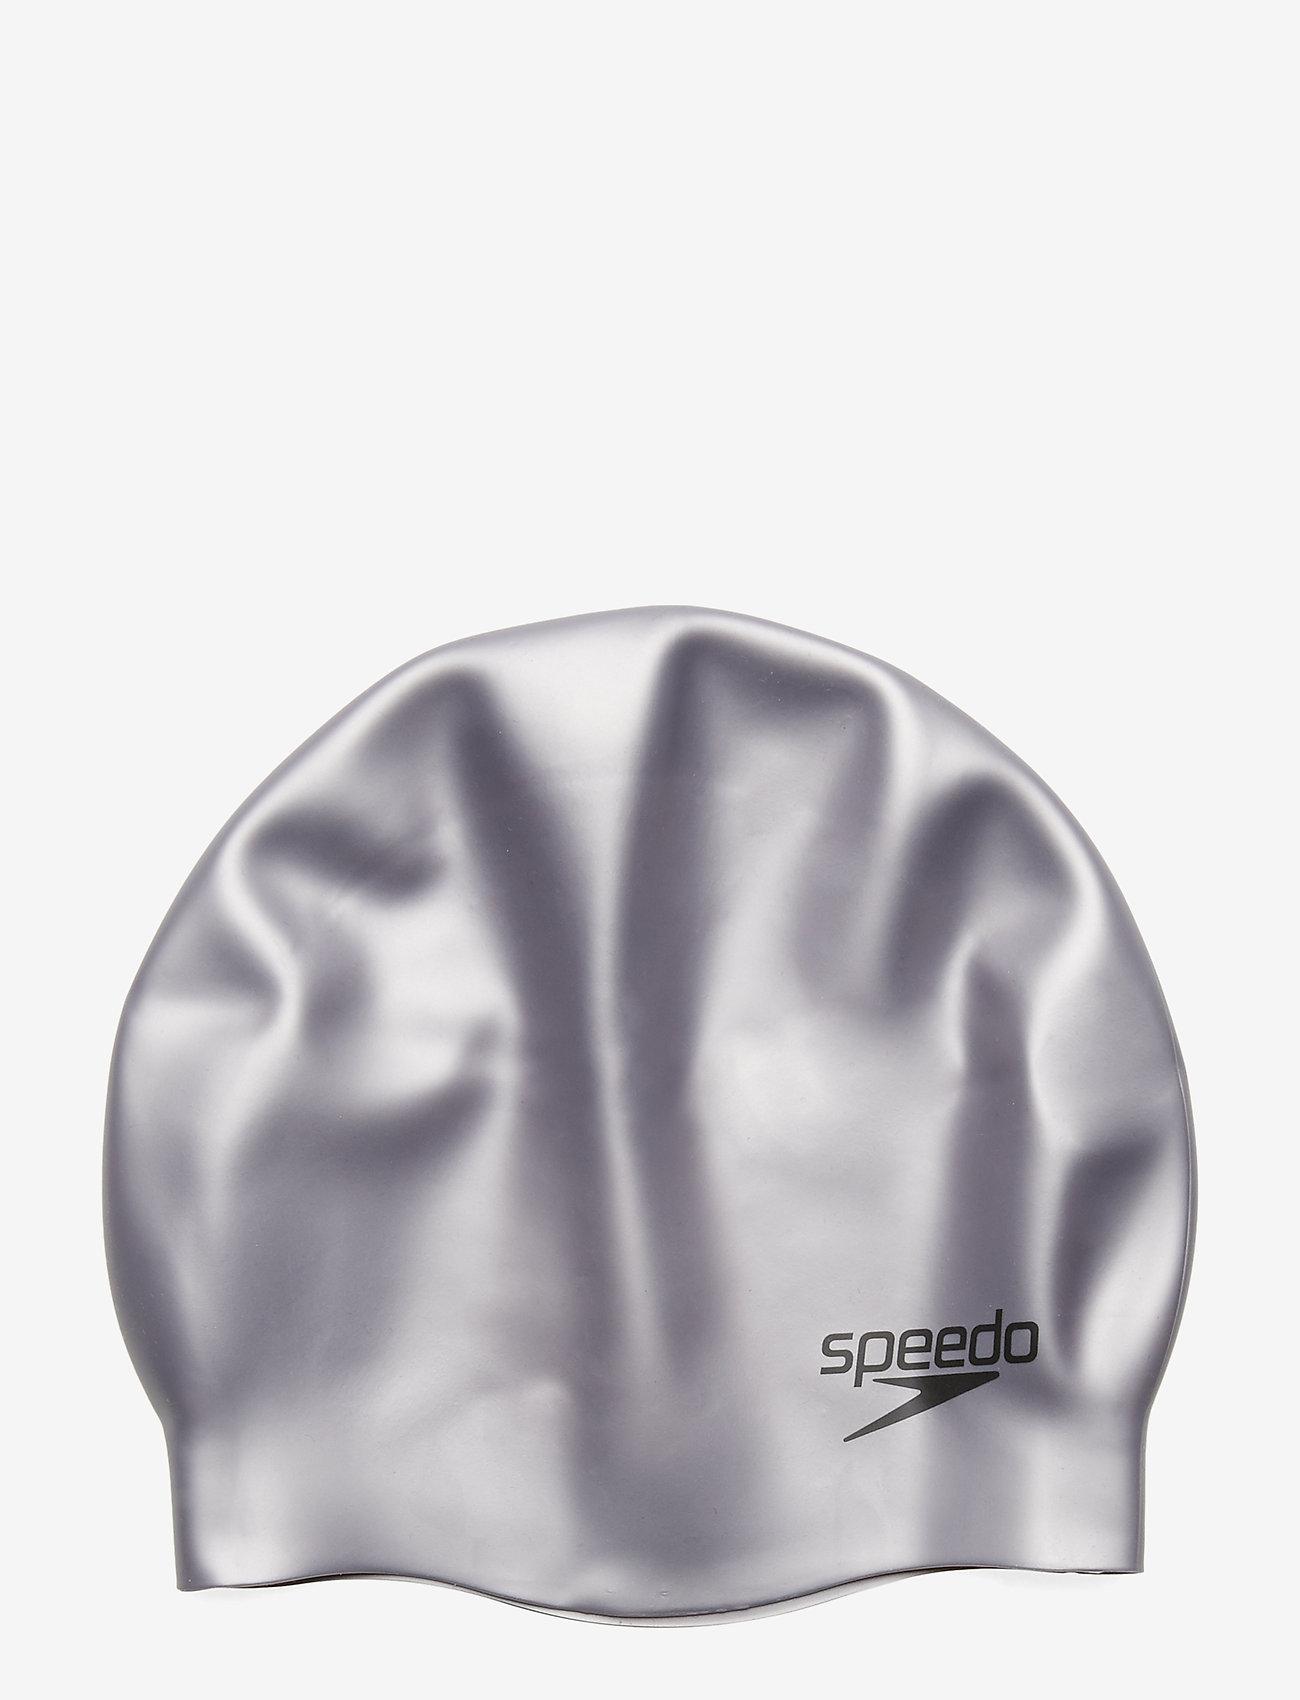 Speedo - SPEEDO SILICON MOULDED CAP AU, WHI MOP - muut - chrome - 1